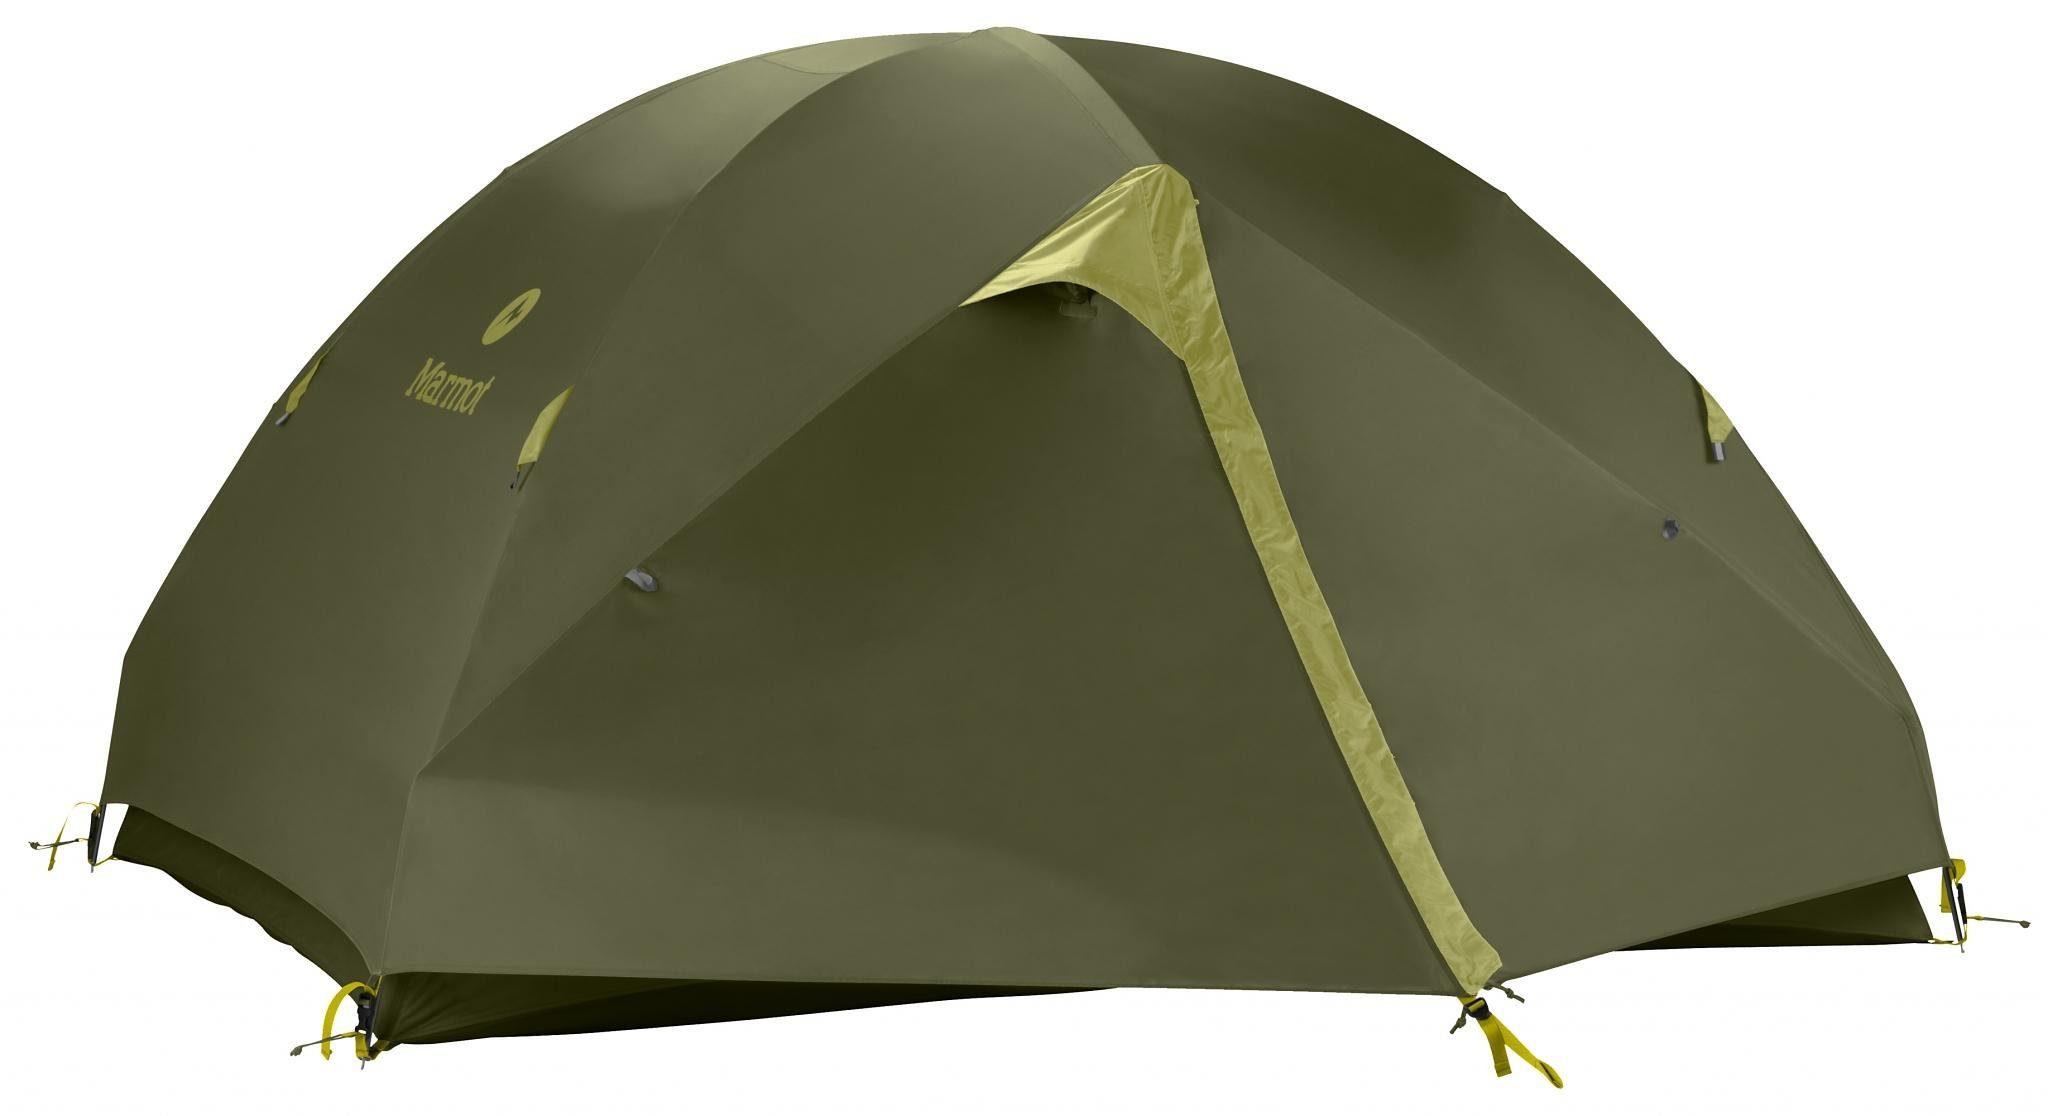 Marmot Zelt »Marmot Vapor 3P Tent«